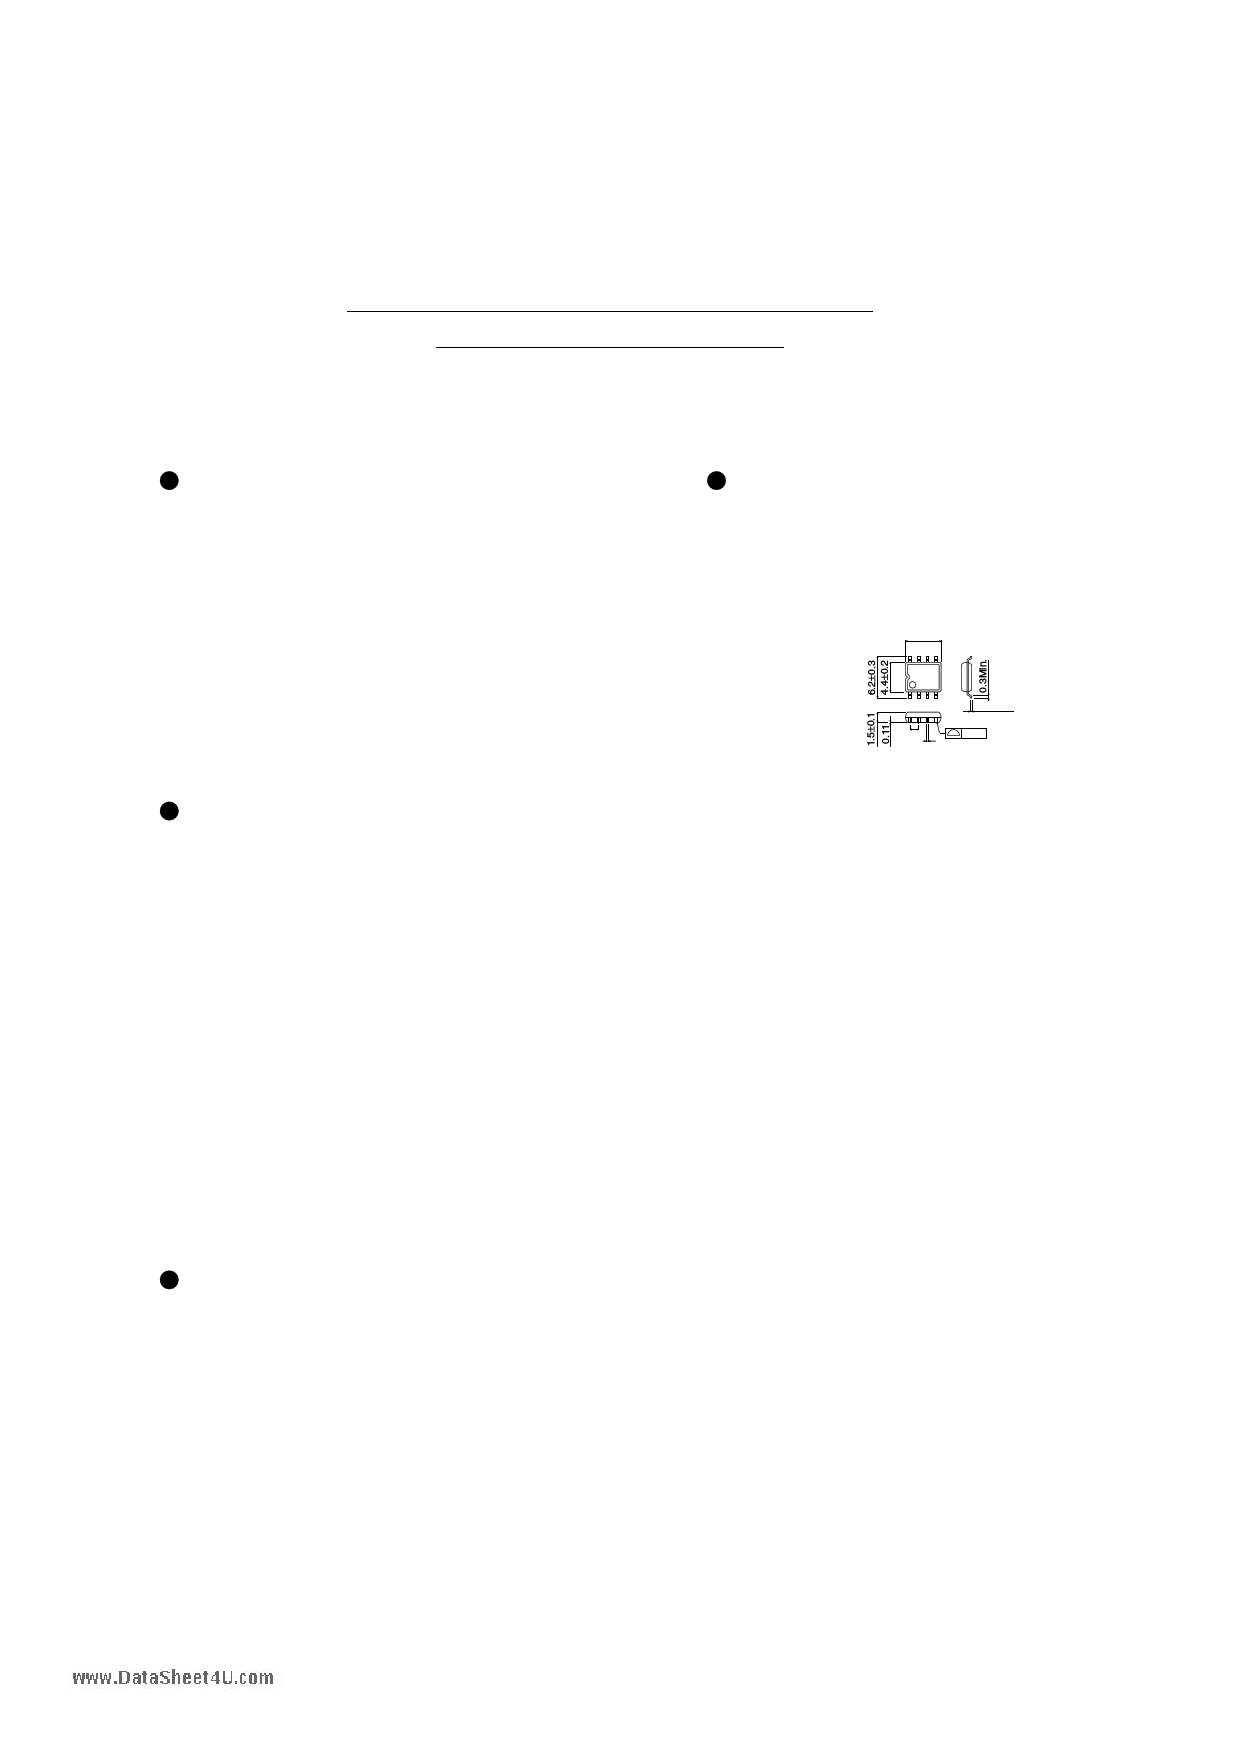 00BC0WF datasheet